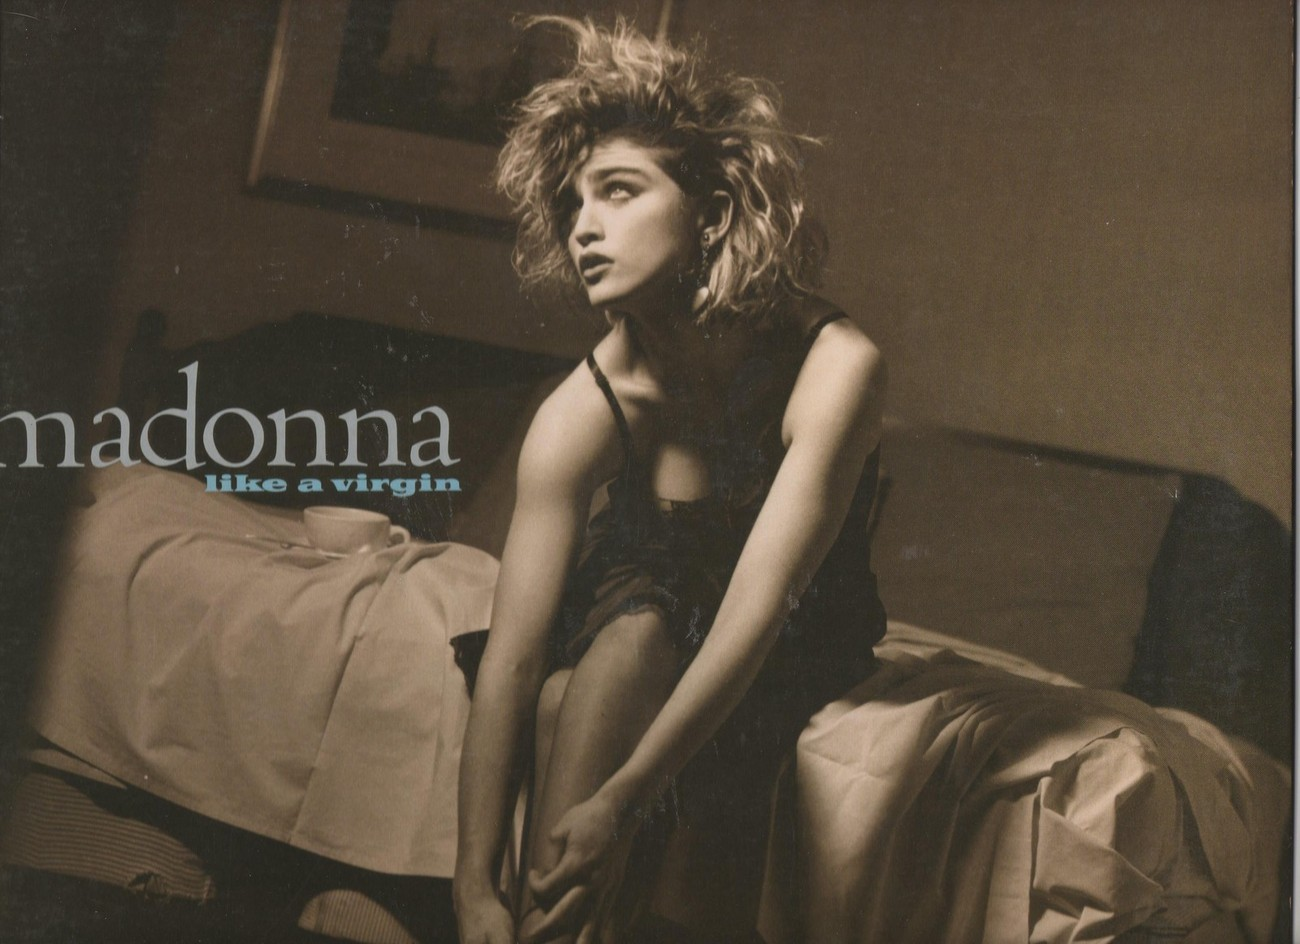 Madonna Like A Virgin Vinyl LP Original Pressing Sire Records 1984